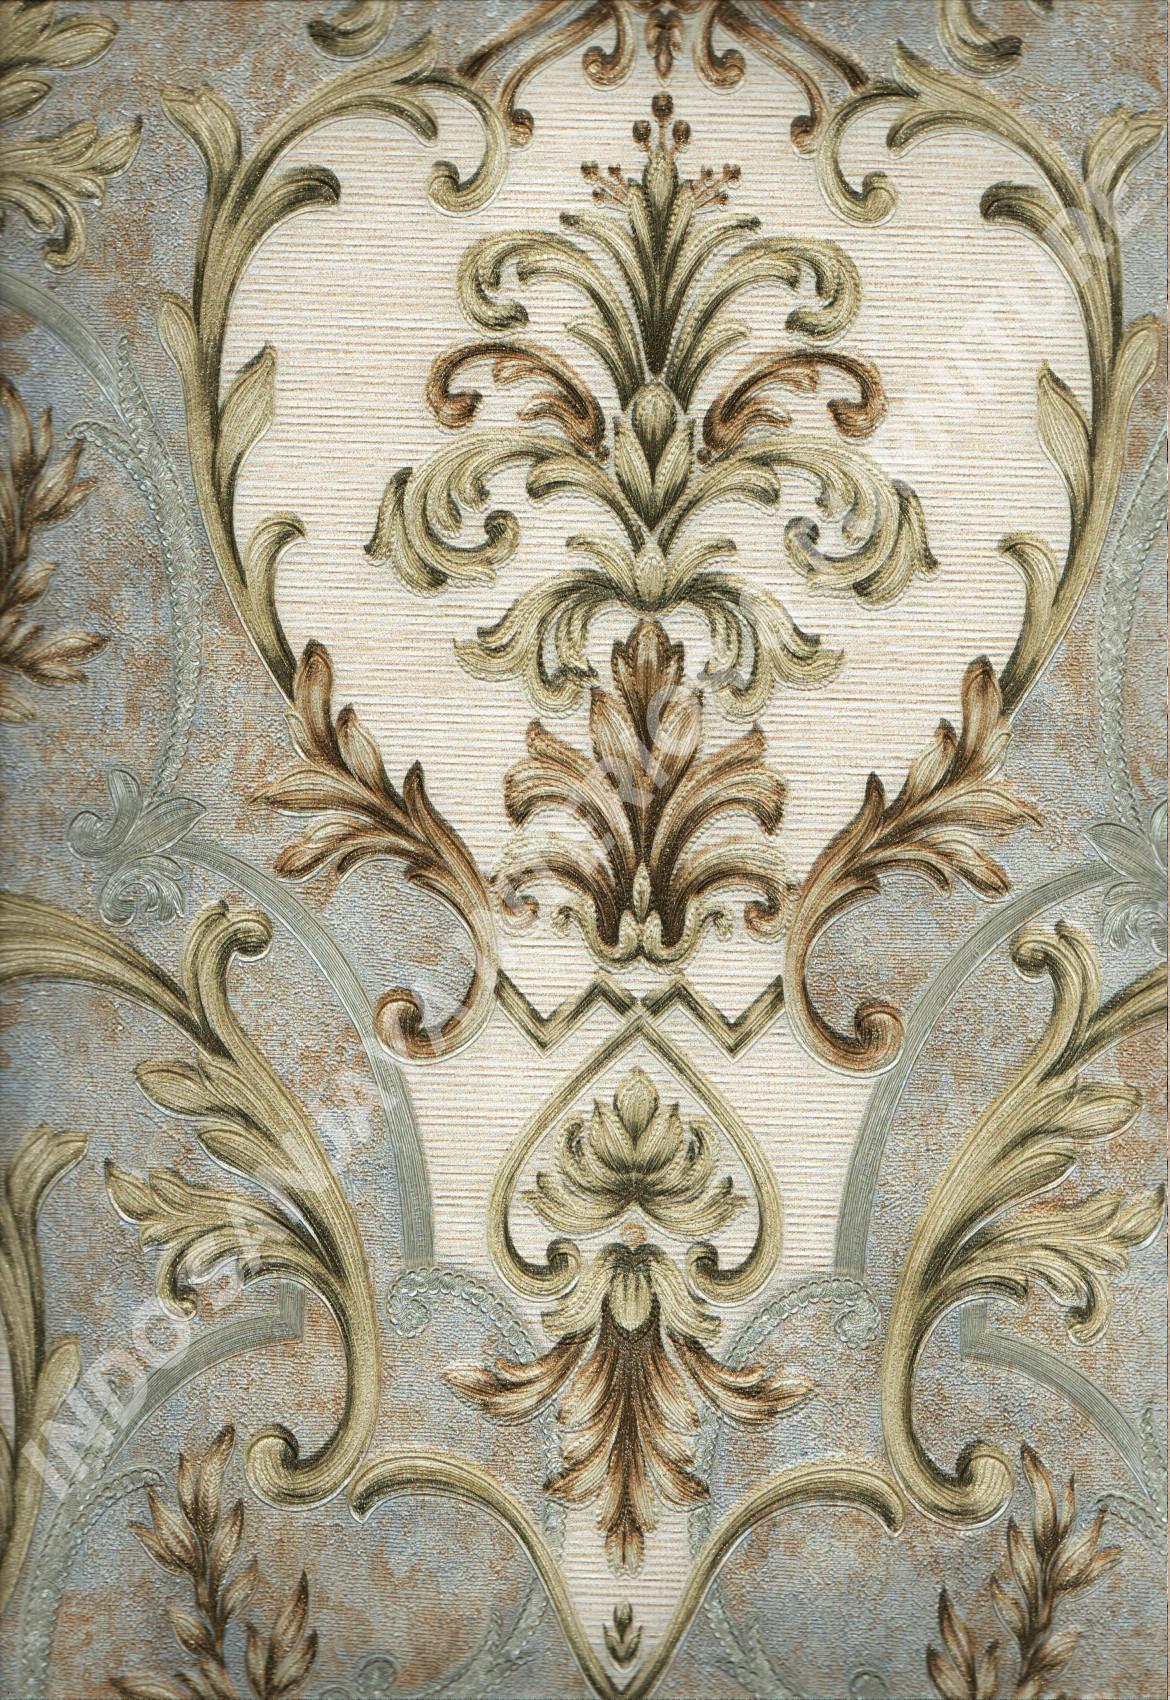 wallpaper   Wallpaper Klasik Batik (Damask) DL11001:DL11001 corak  warna